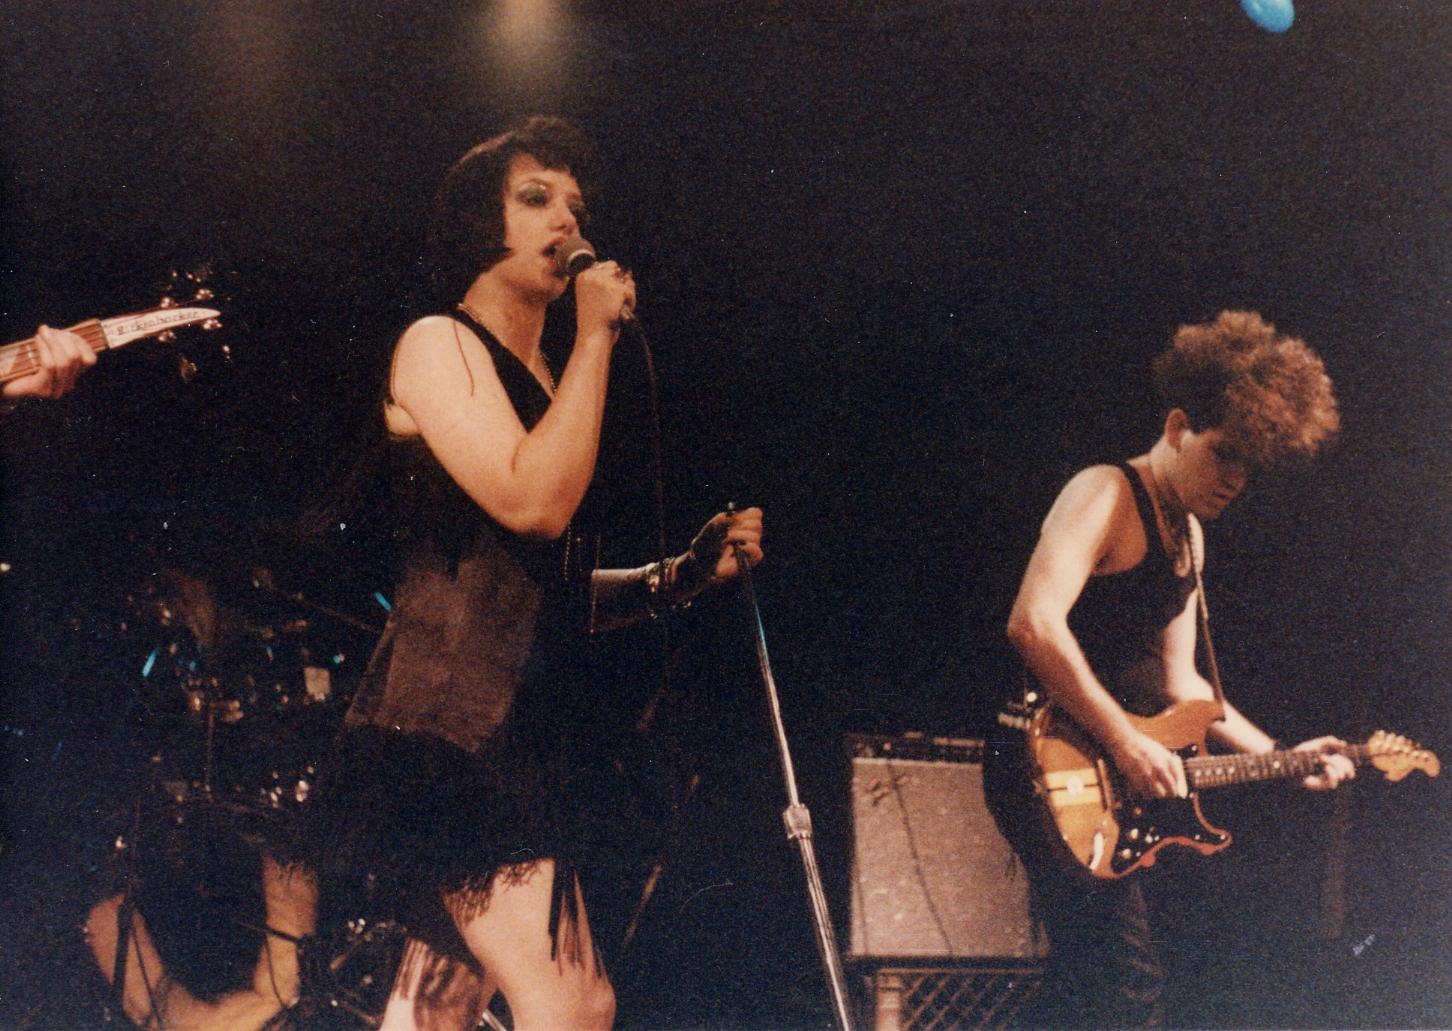 1985-08-12 (30)